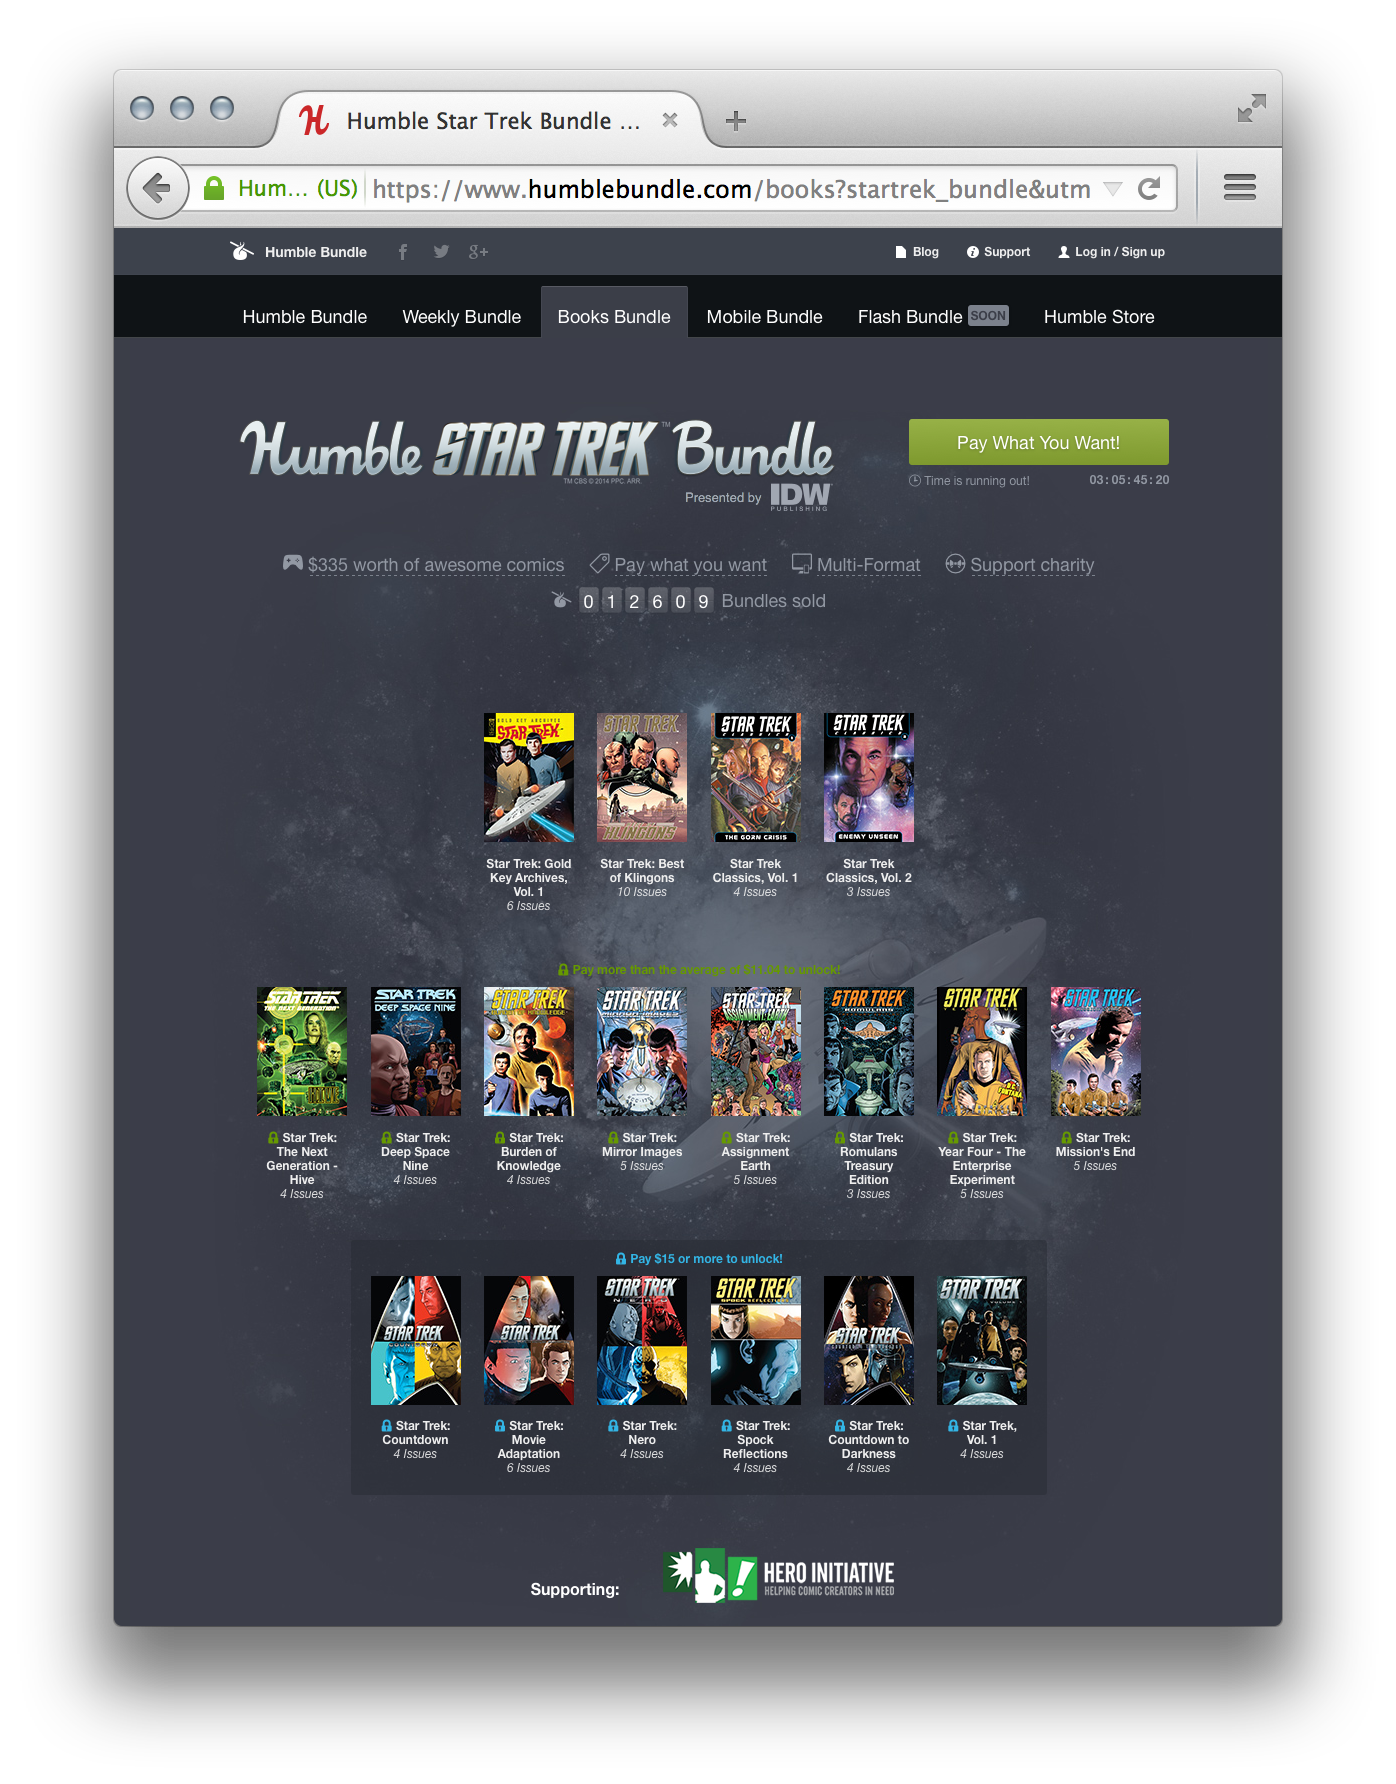 Humble Star Trek Bundle